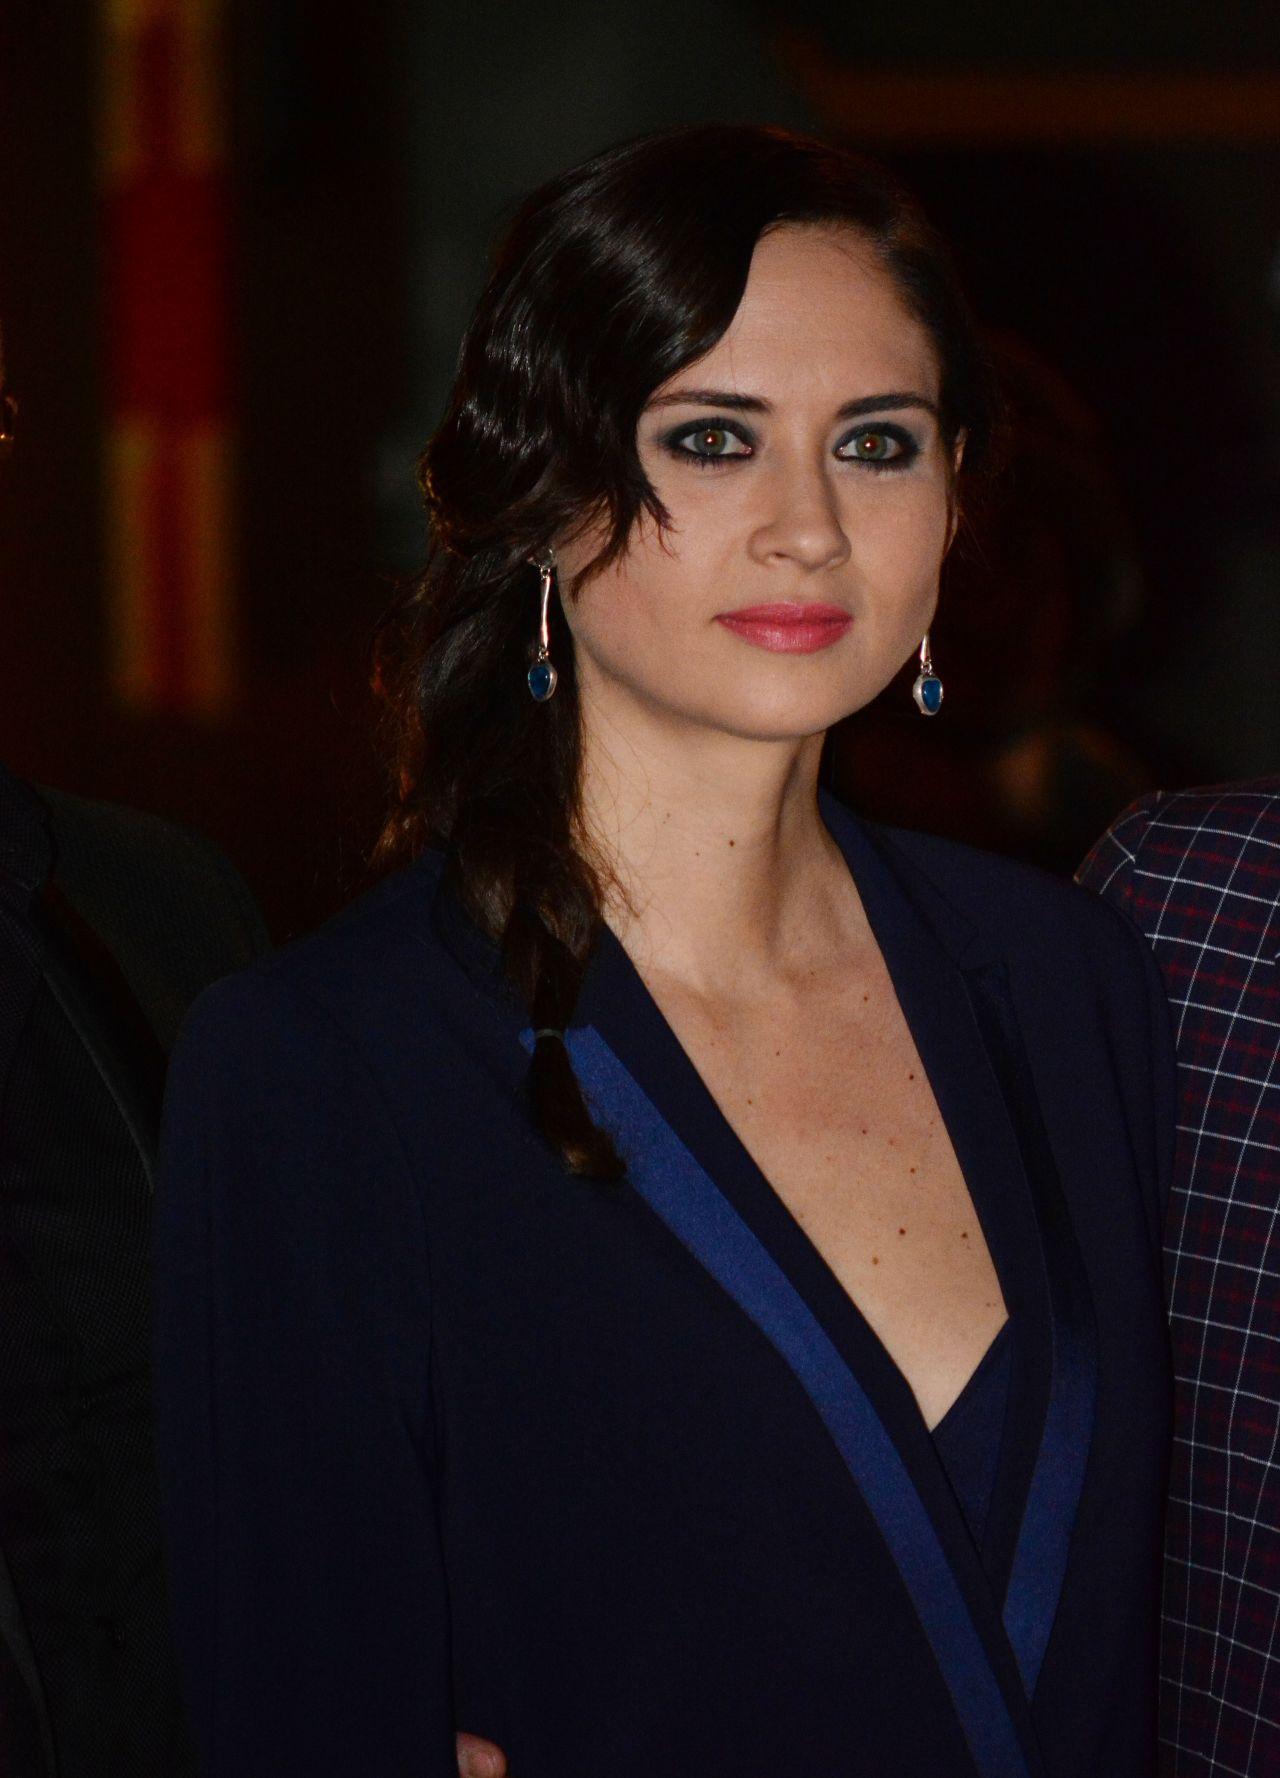 Berta Hernandez